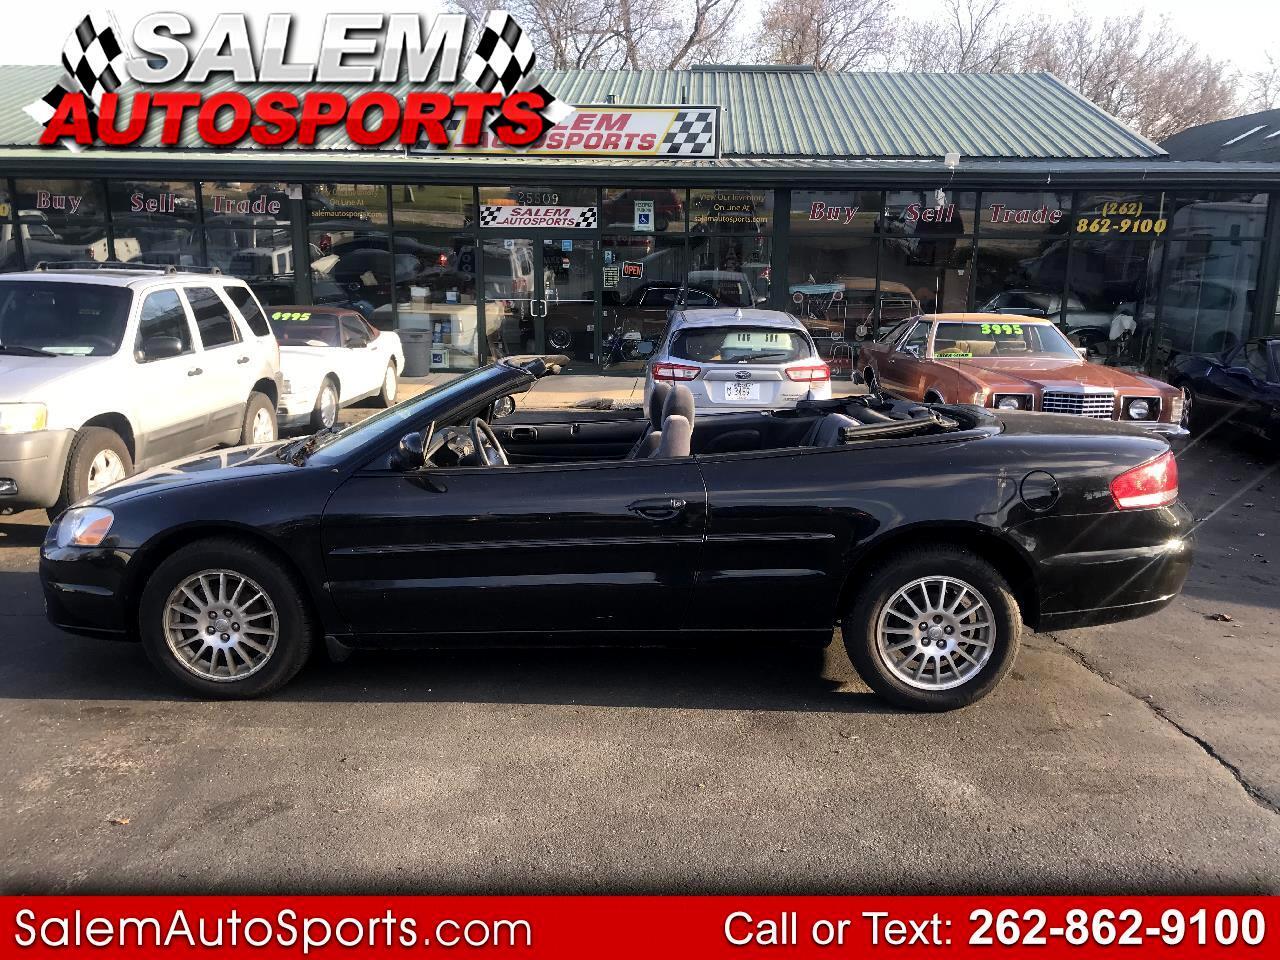 2006 Chrysler Sebring Conv 2dr Touring